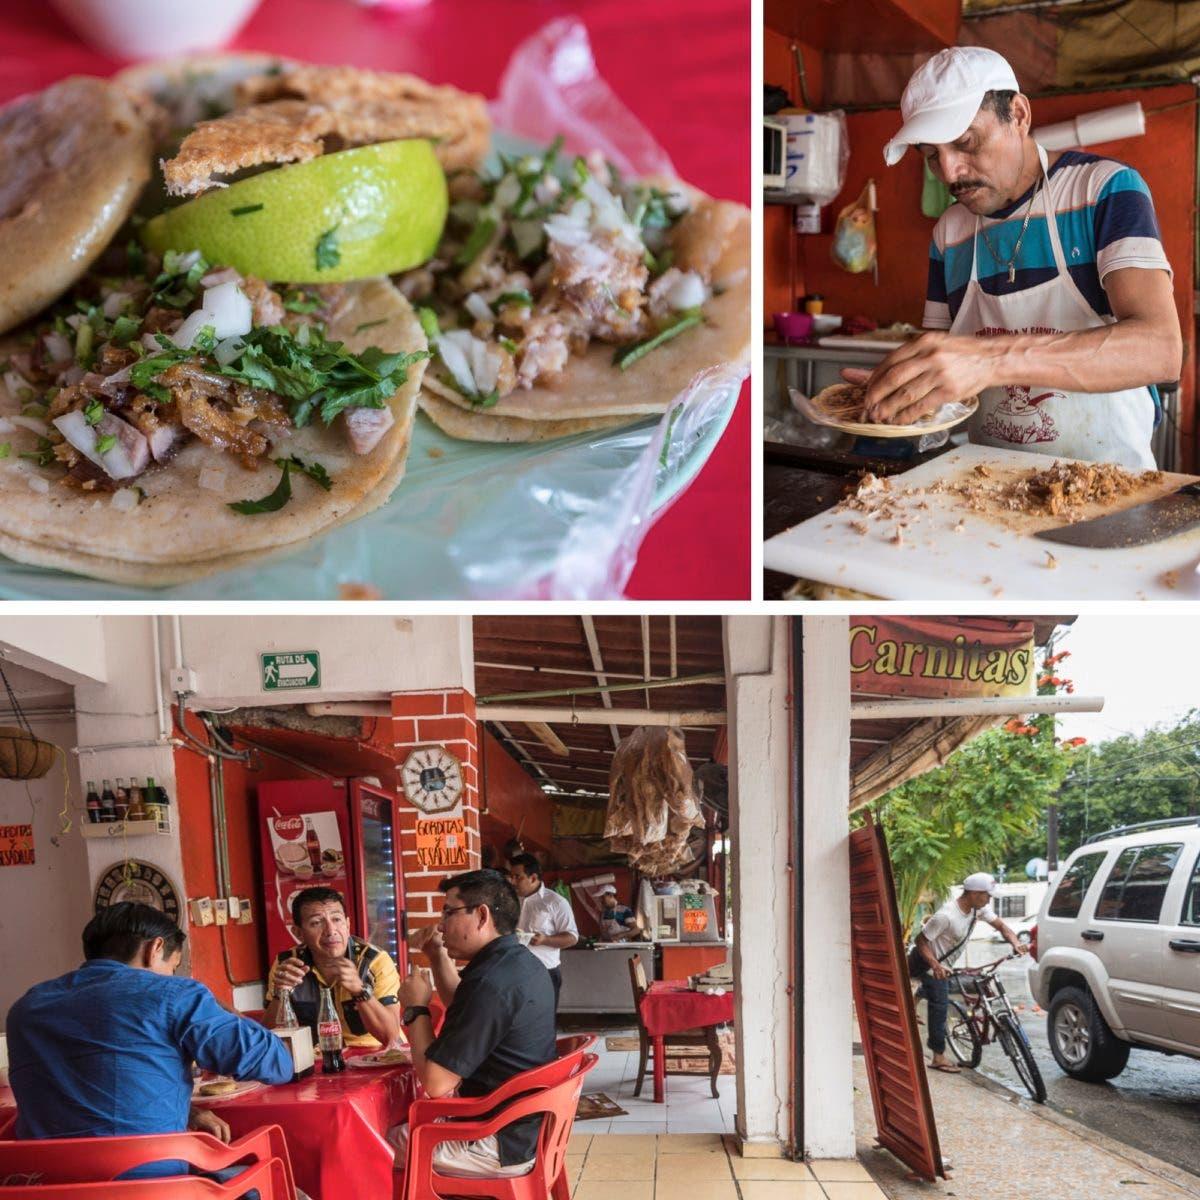 Unsere ersten Tacos mit Carnitas gab es in Playa del Carmen